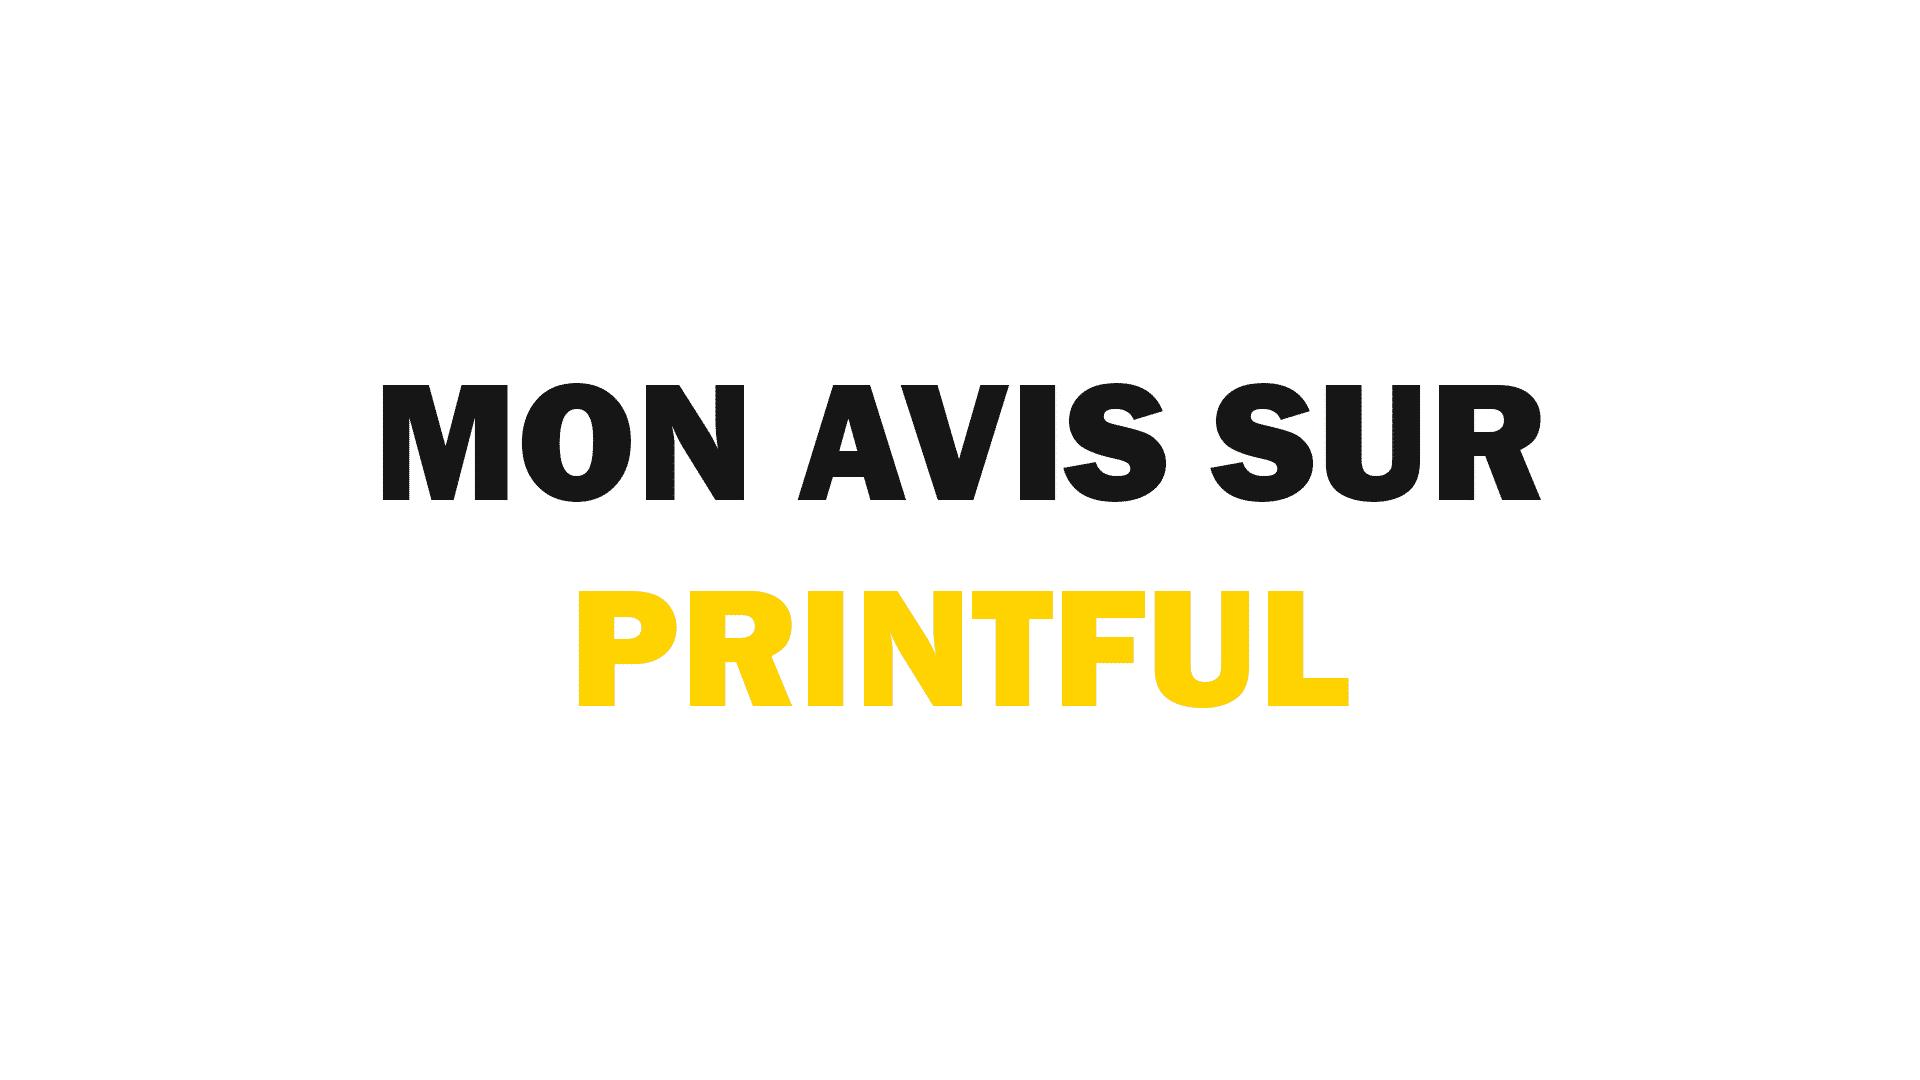 Printful : mon avis pour du POD en France et en Europe avec Shopify